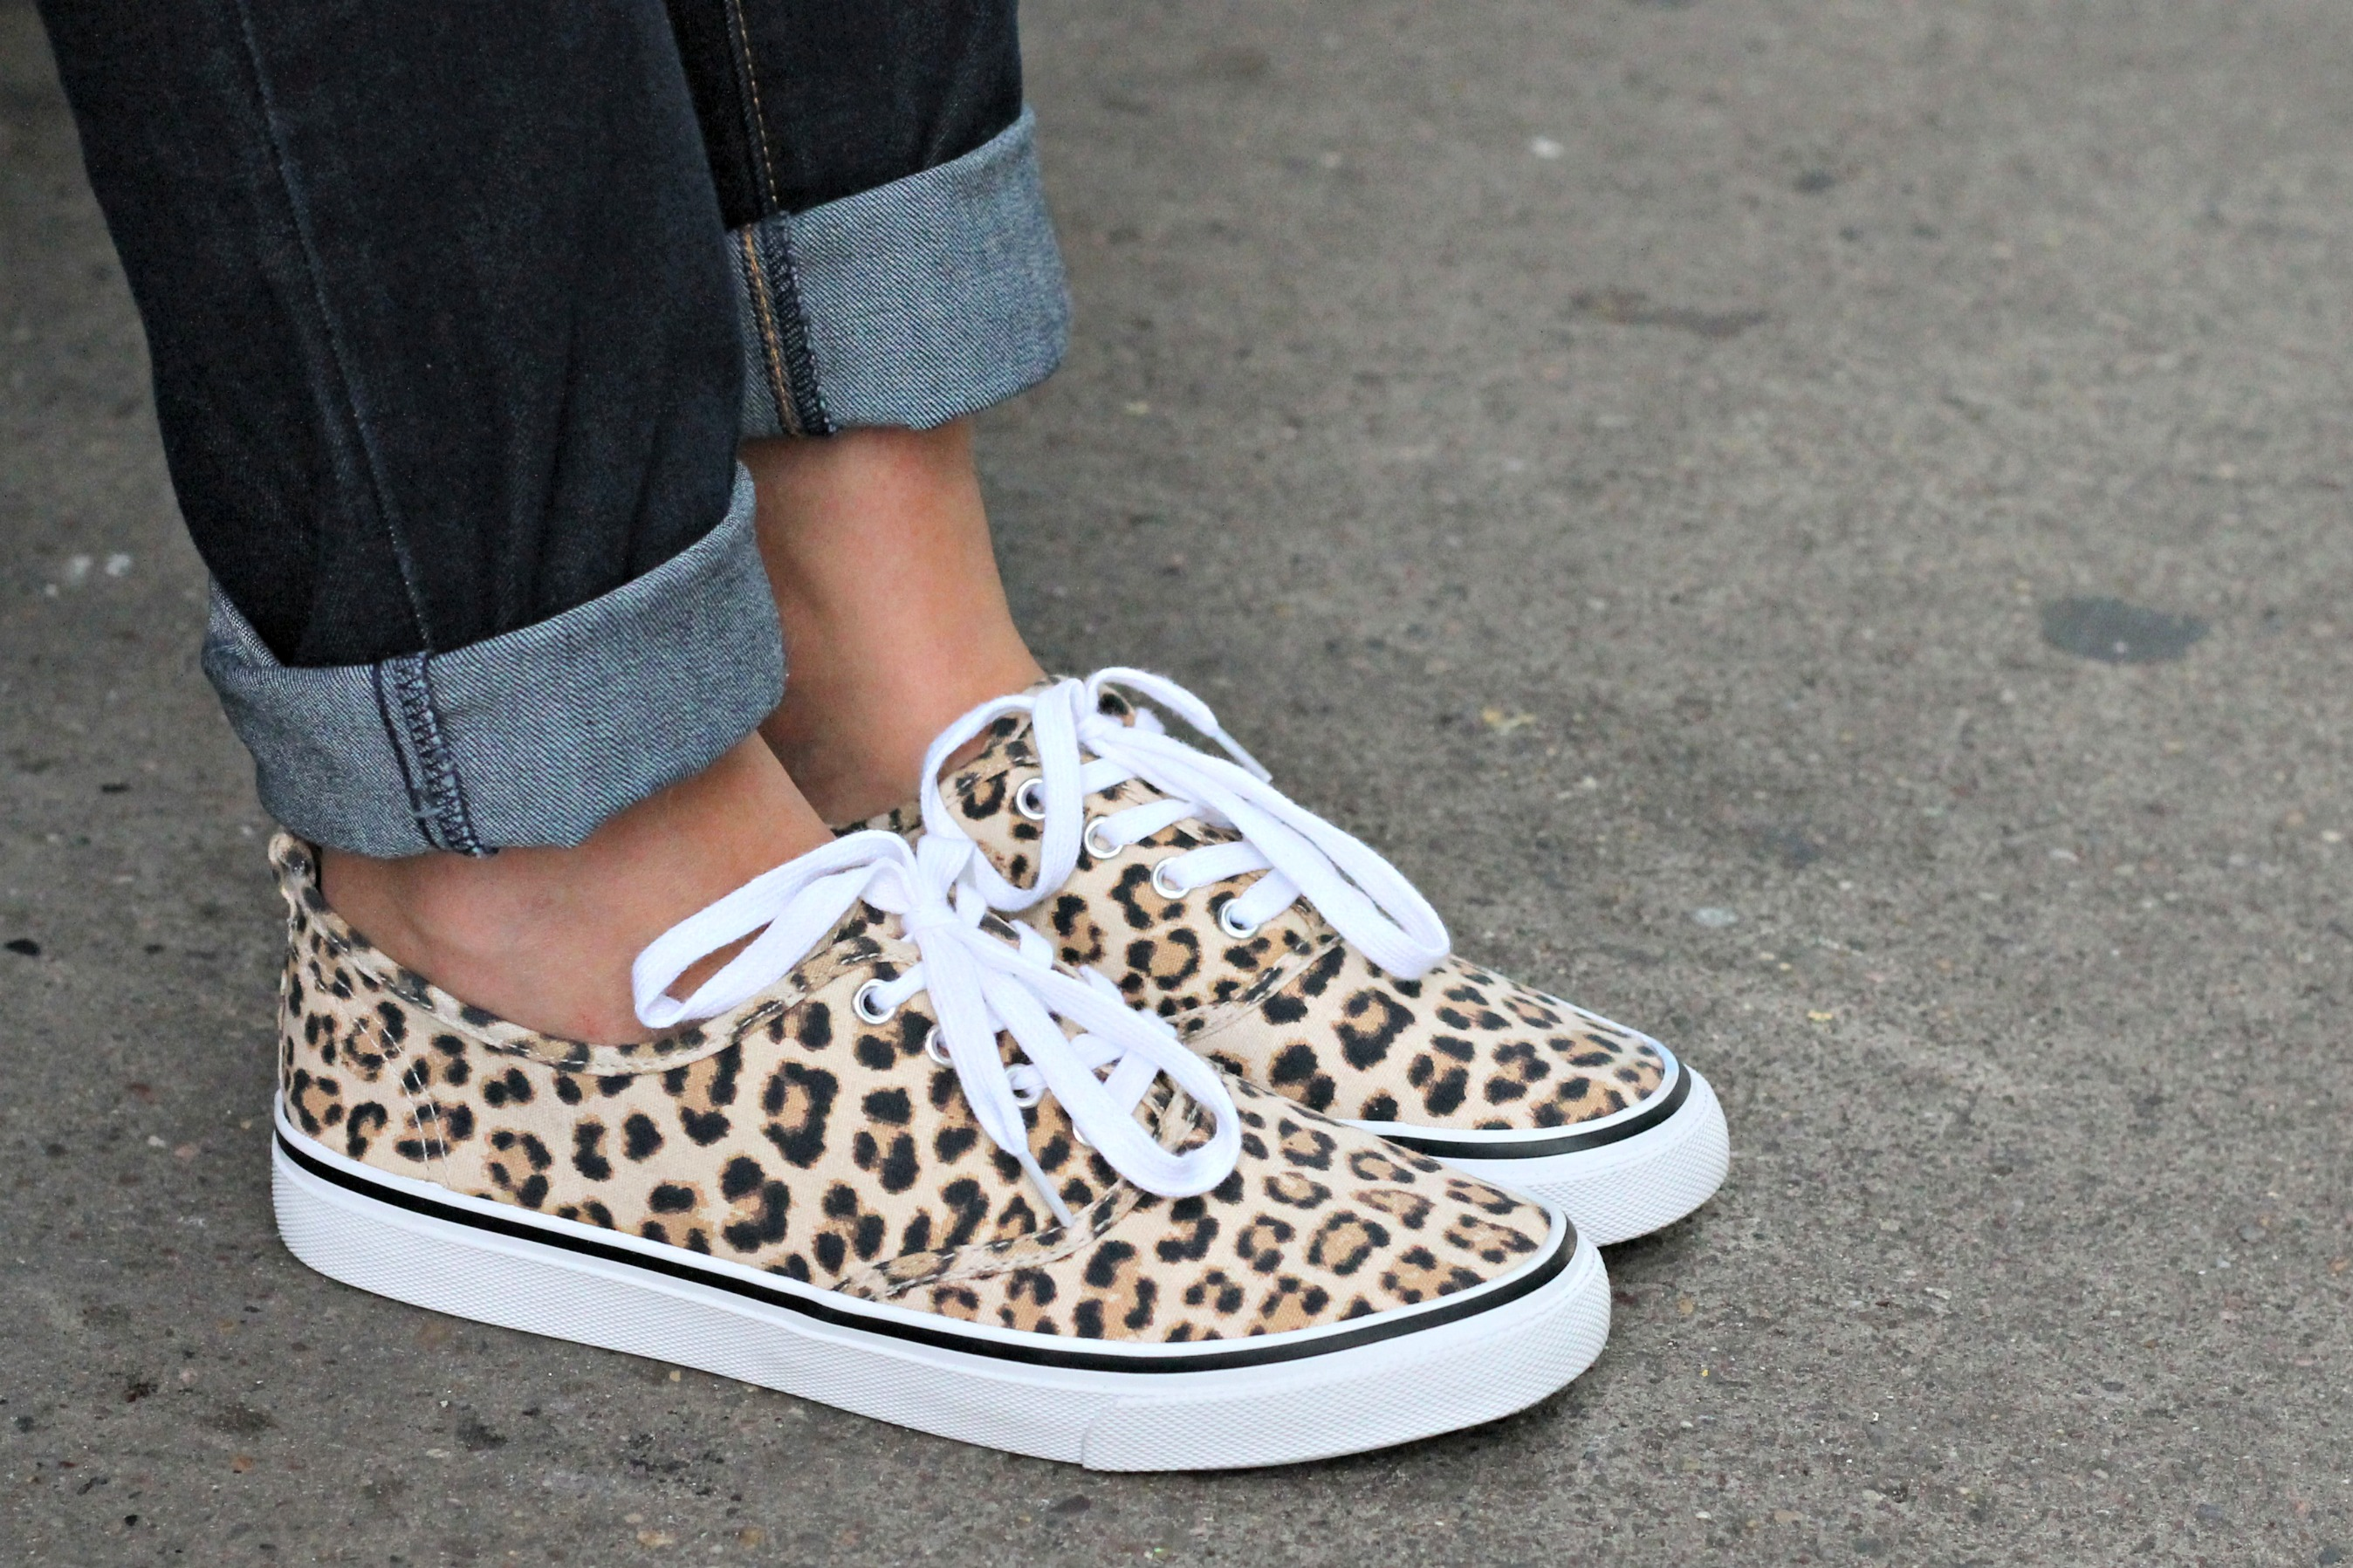 e3b32fb113ae Leopard tennis shoes – Shoes